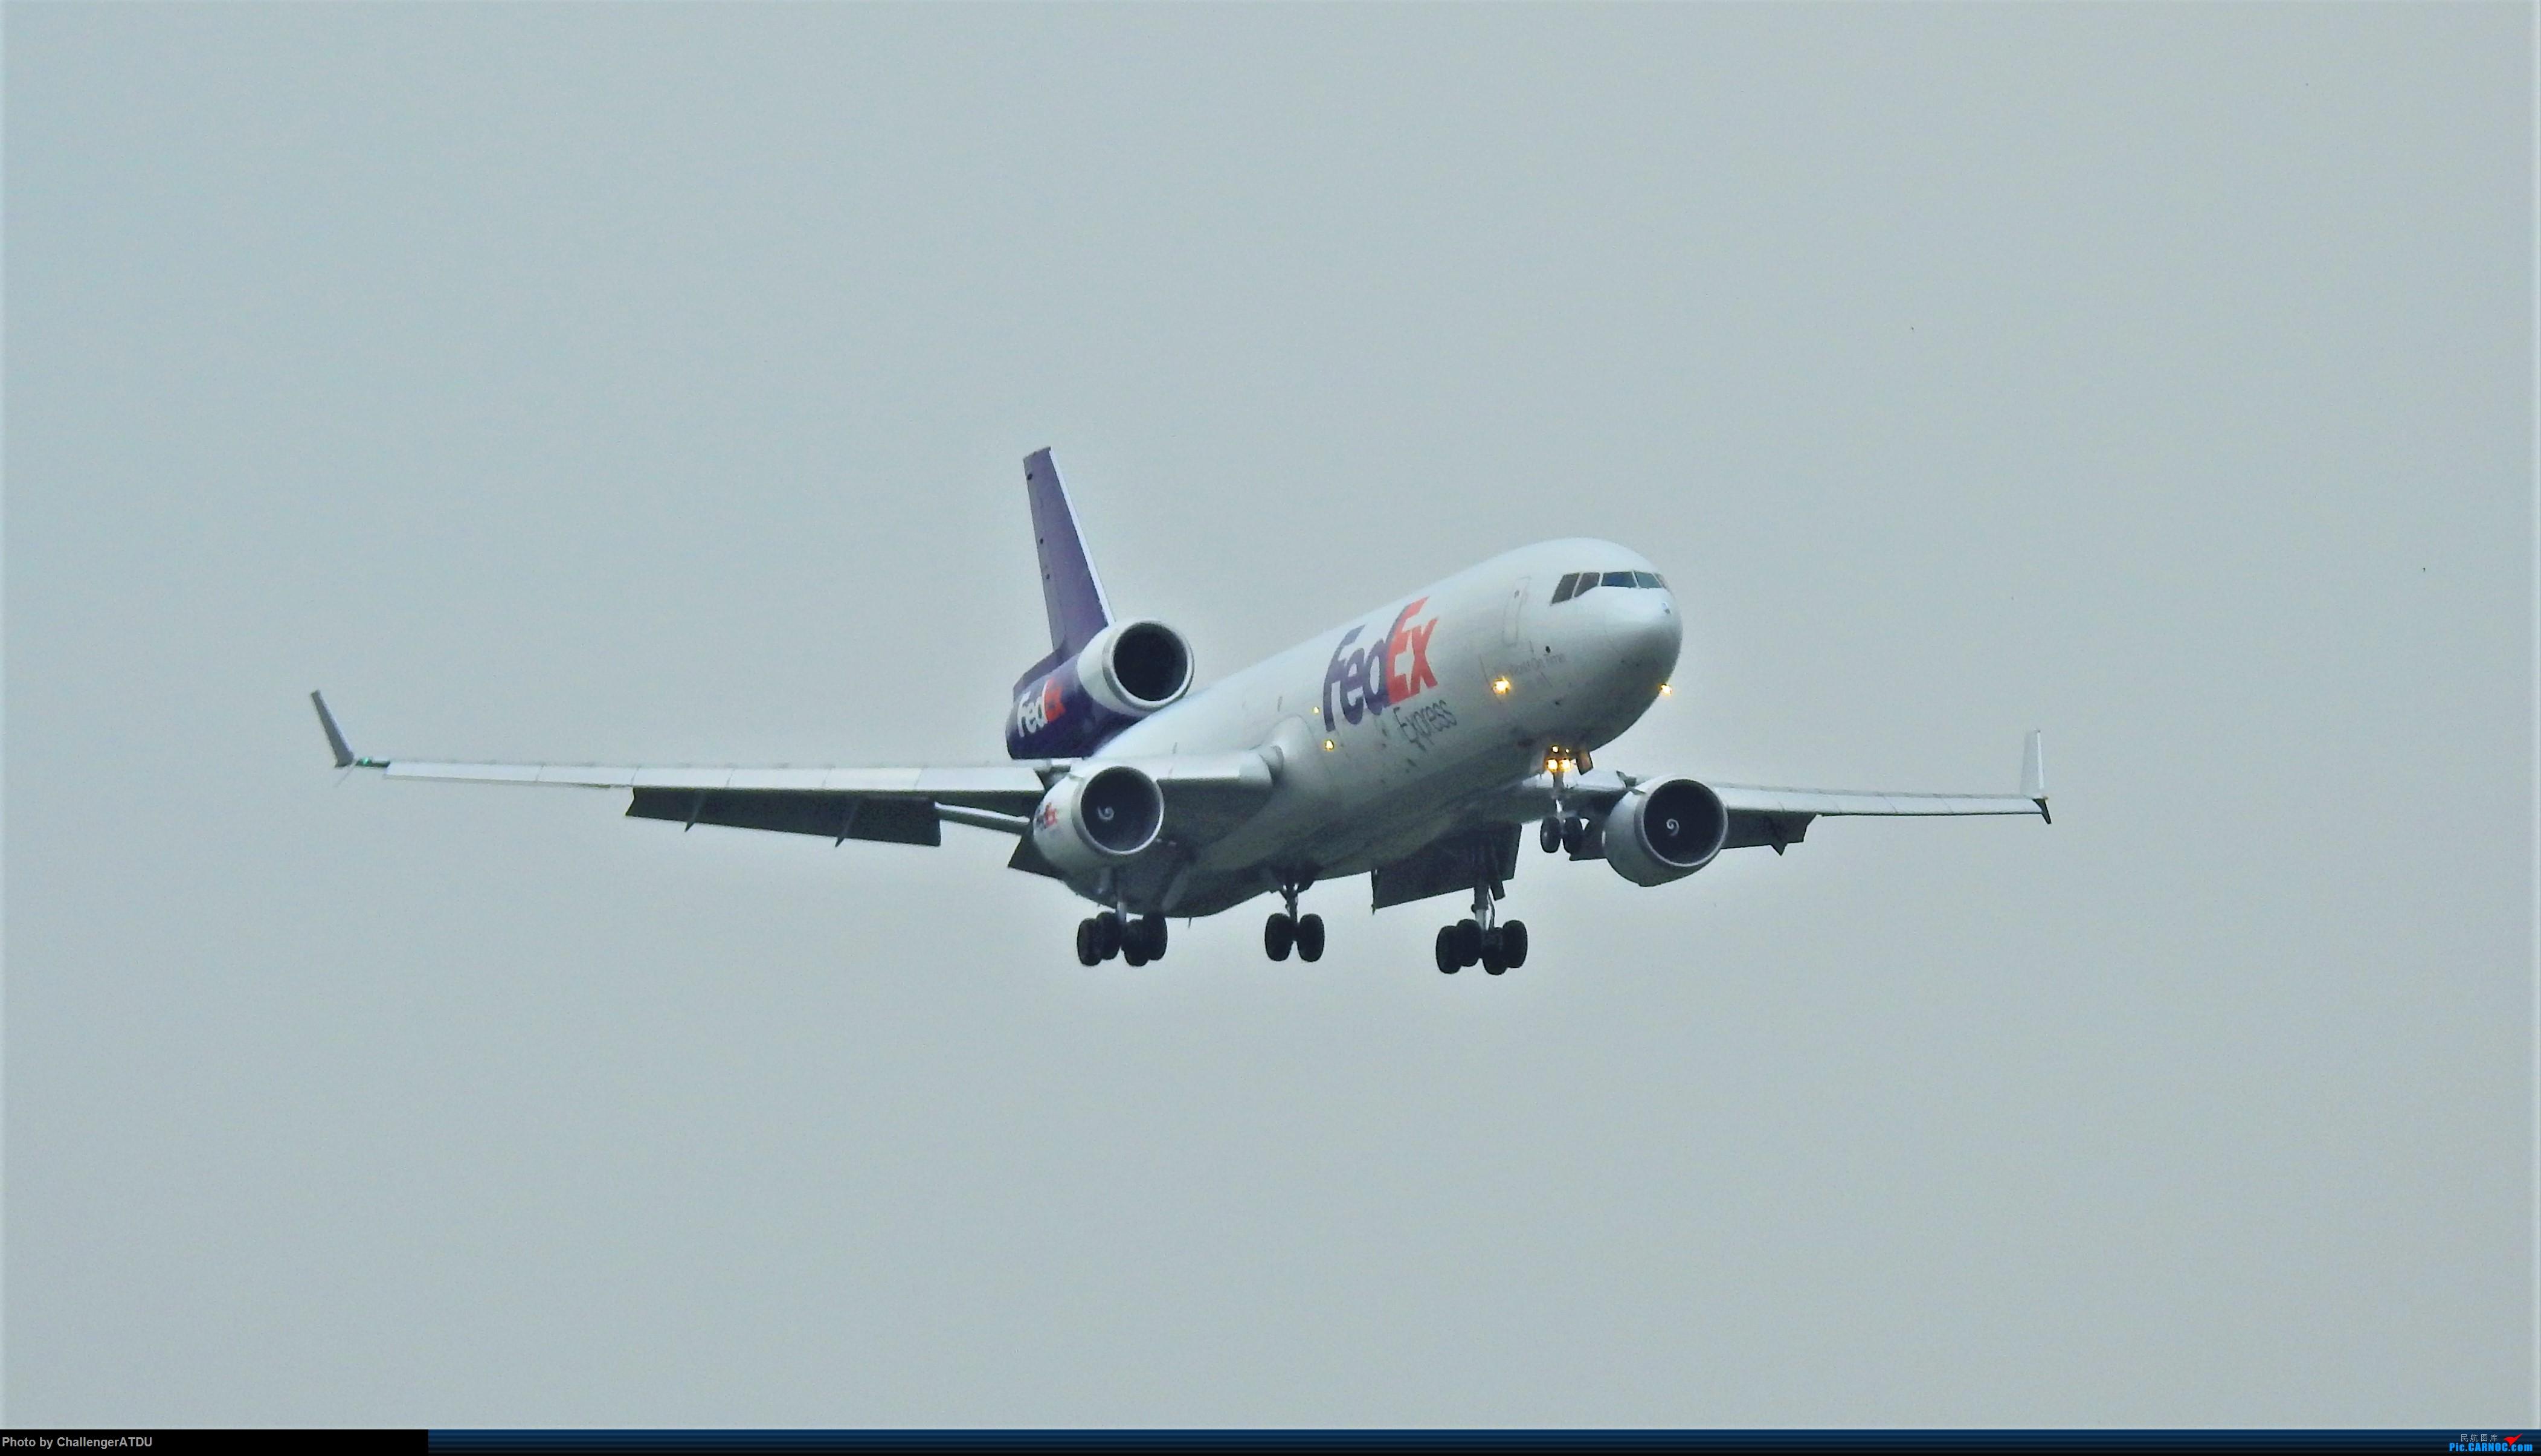 [原创]2020-5-30 萌新のPEK之旅 MD MD-11 N602FE 北京首都国际机场